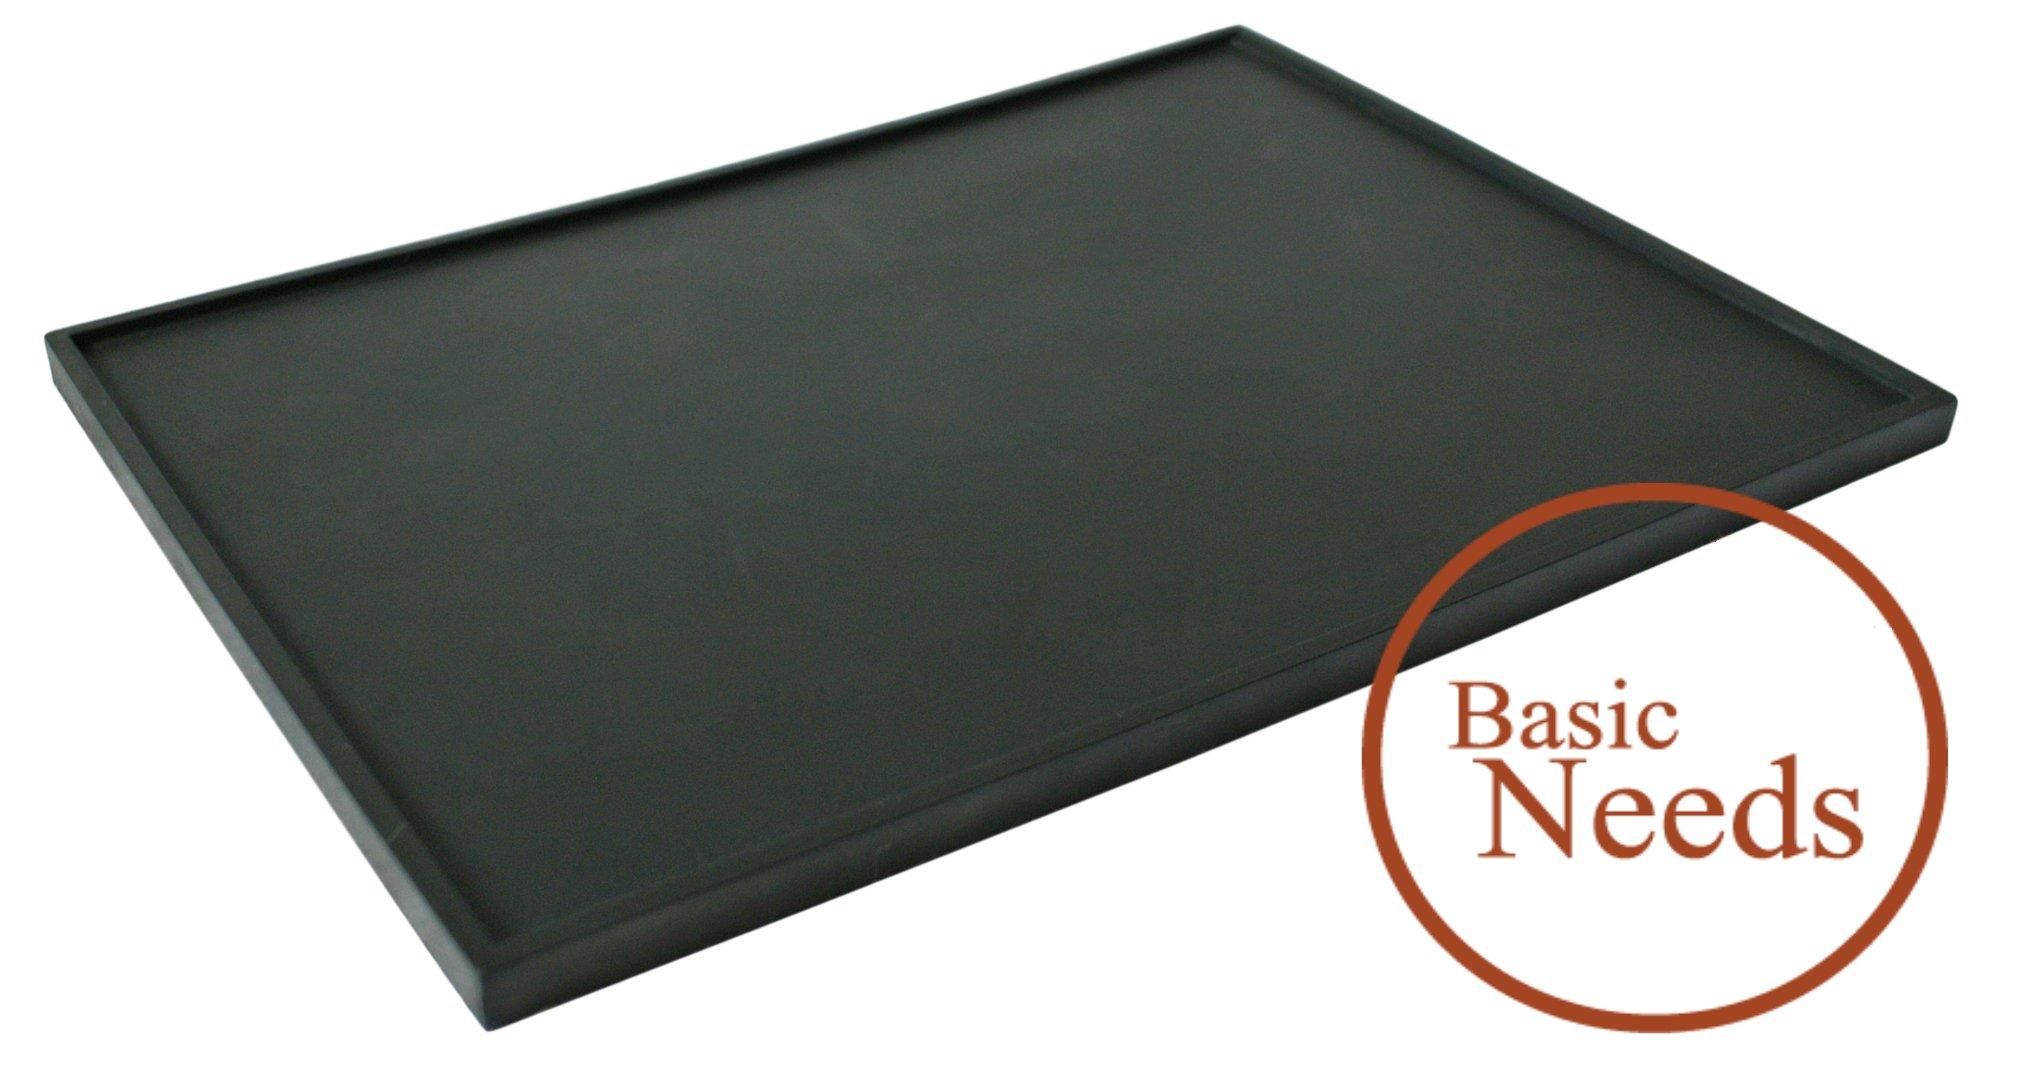 Basic Needs Coffee Tamping Mat - Food Grade Silicone Rubber Tamping Mat by Basic Needs